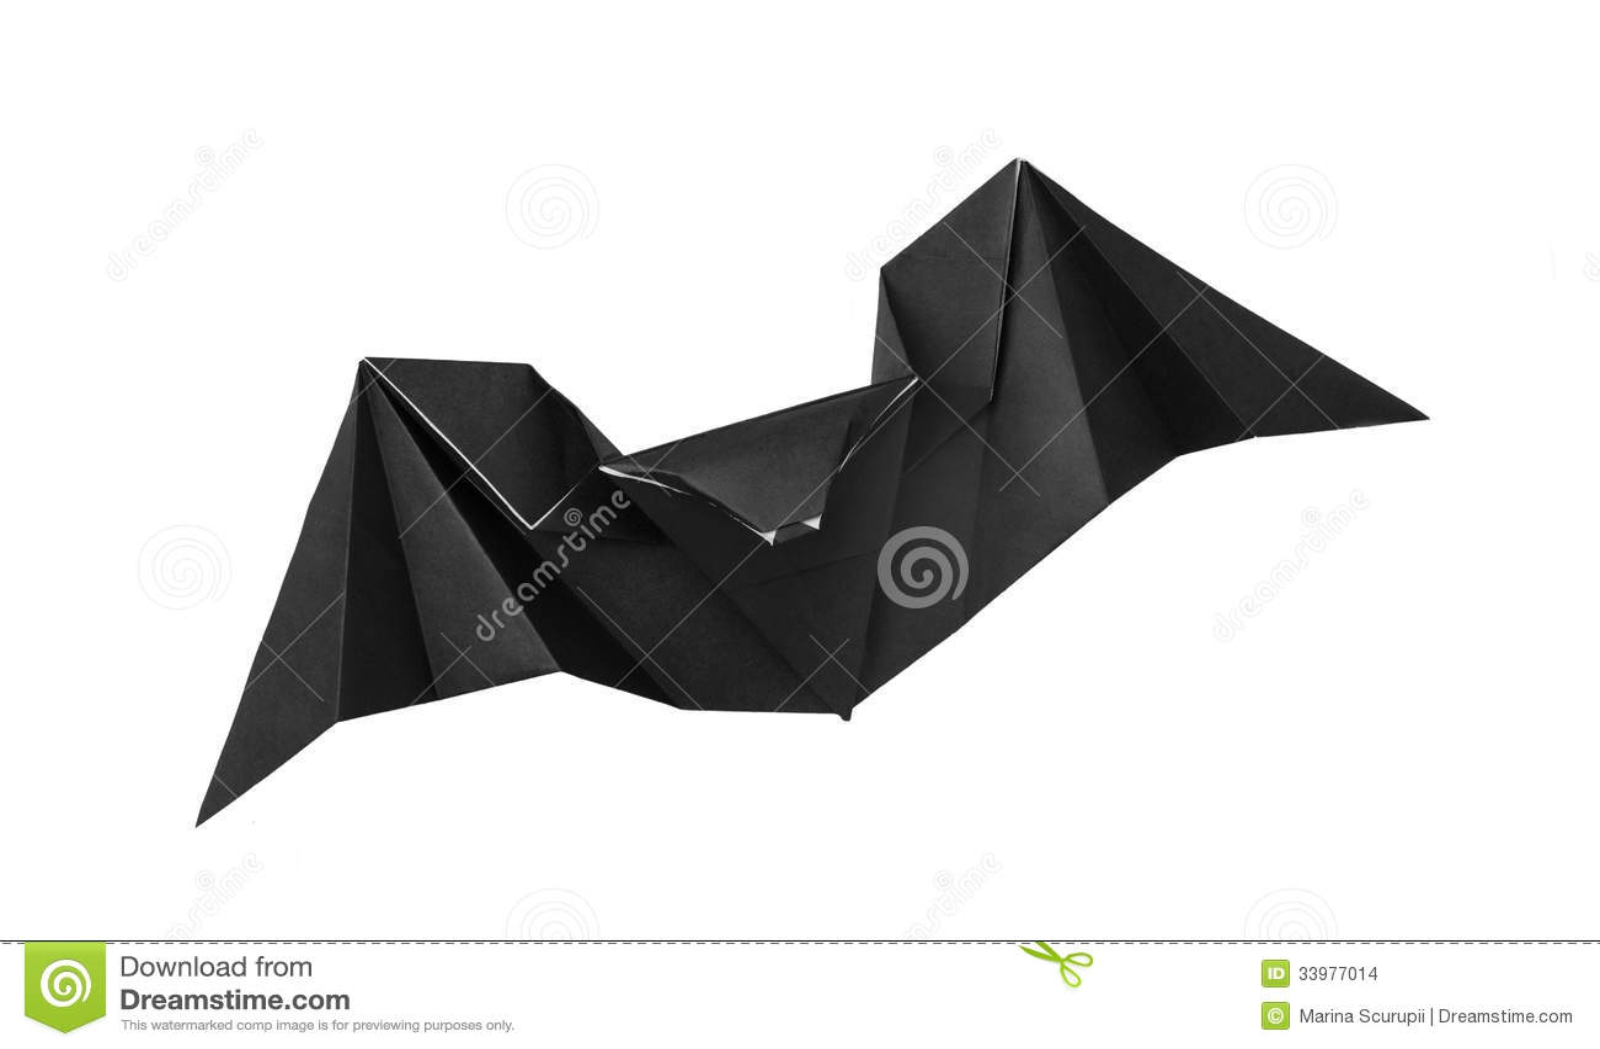 Kirschenbaum, M: Easy Money Origami Kit: Amazon.de: Kirschenbaum ... | 869x1300